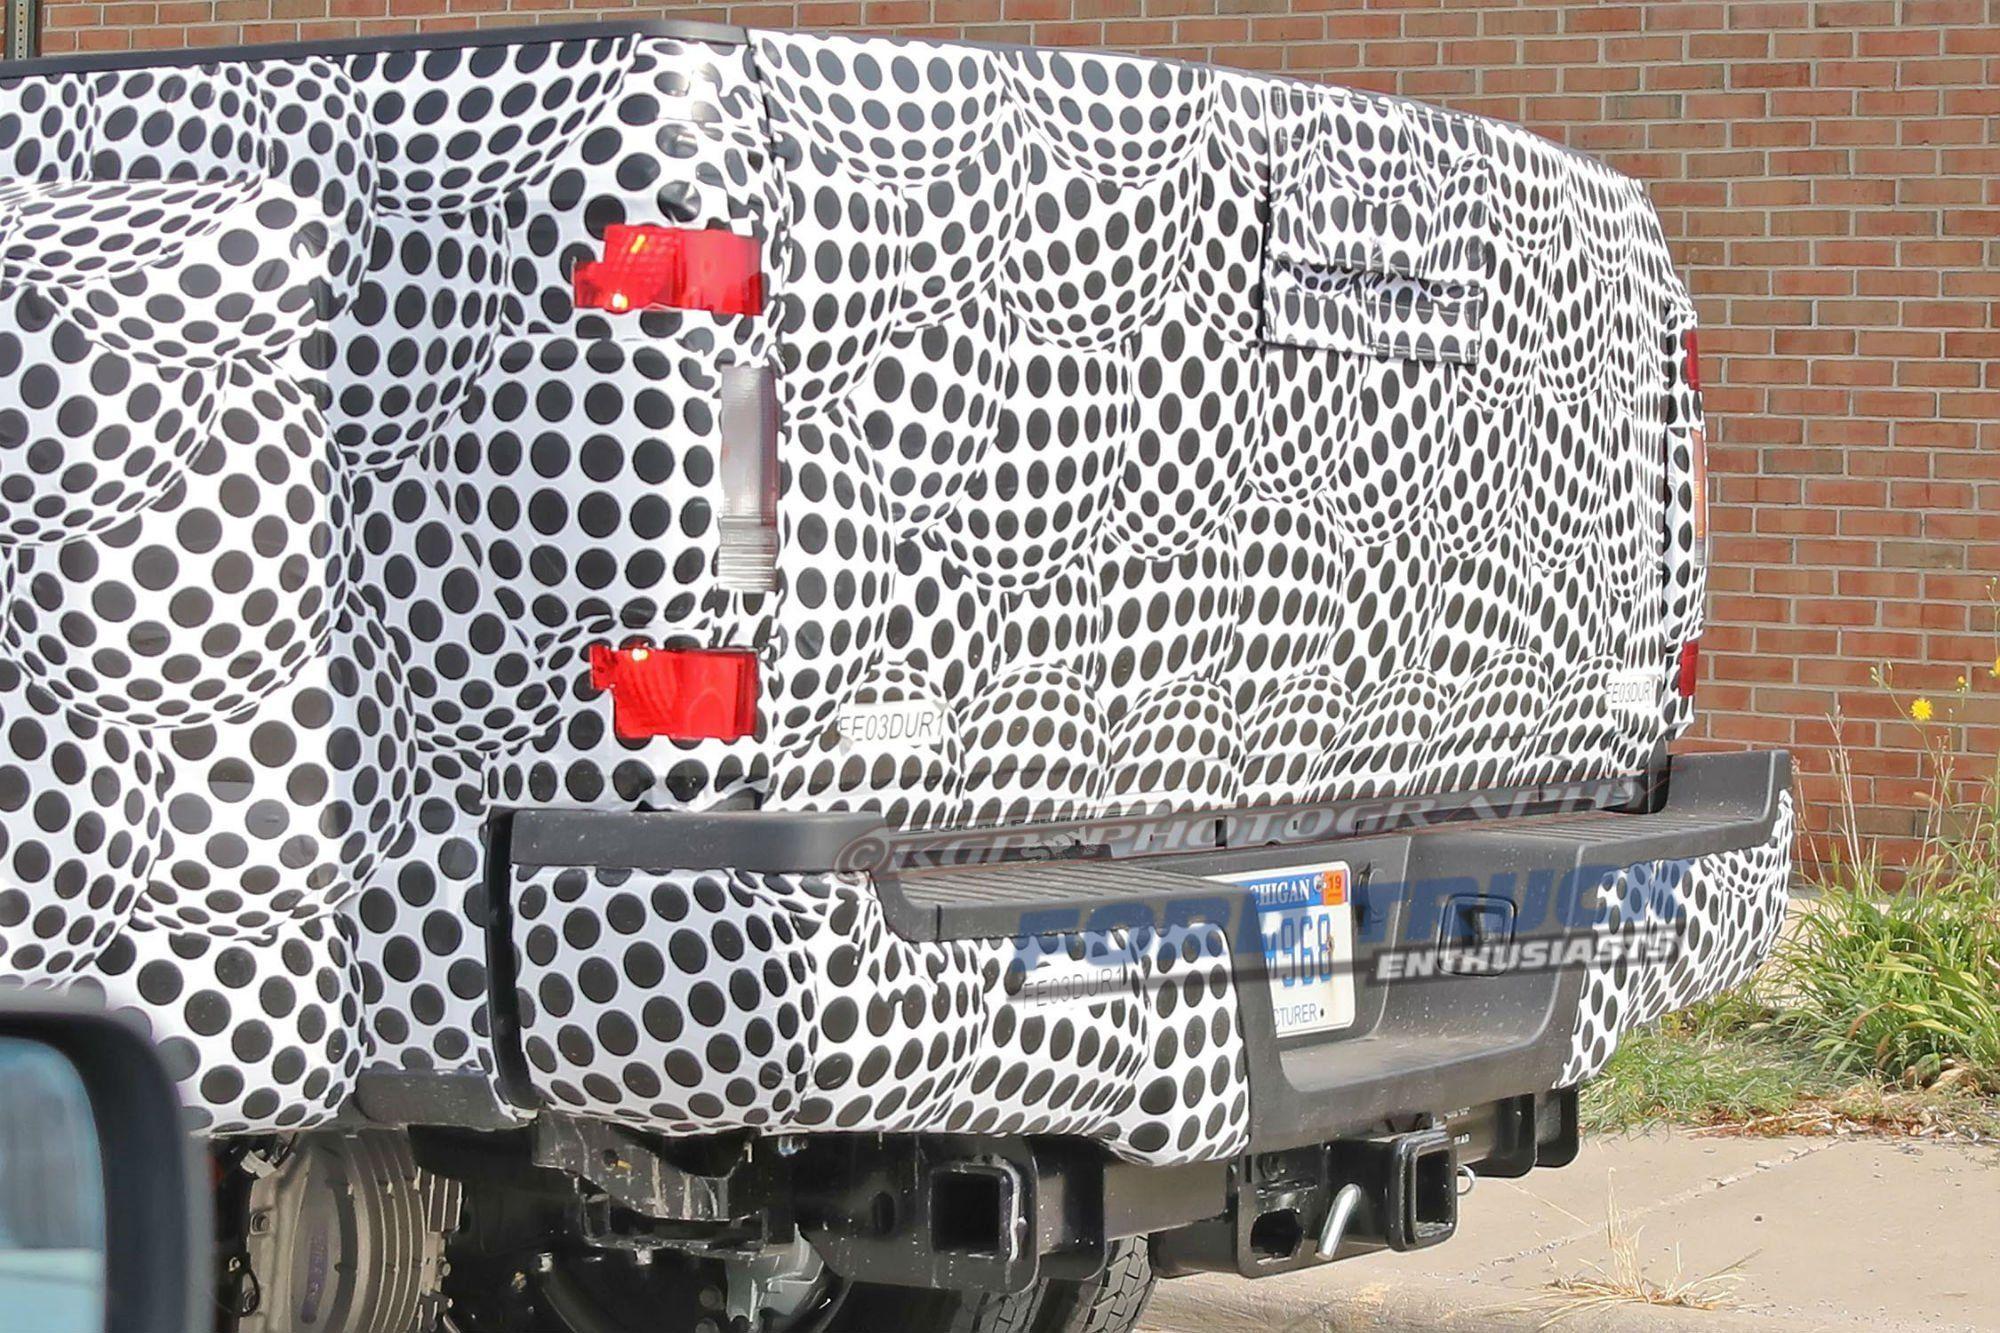 2021 Spy Shots Ford F350 Diesel Wallpaper